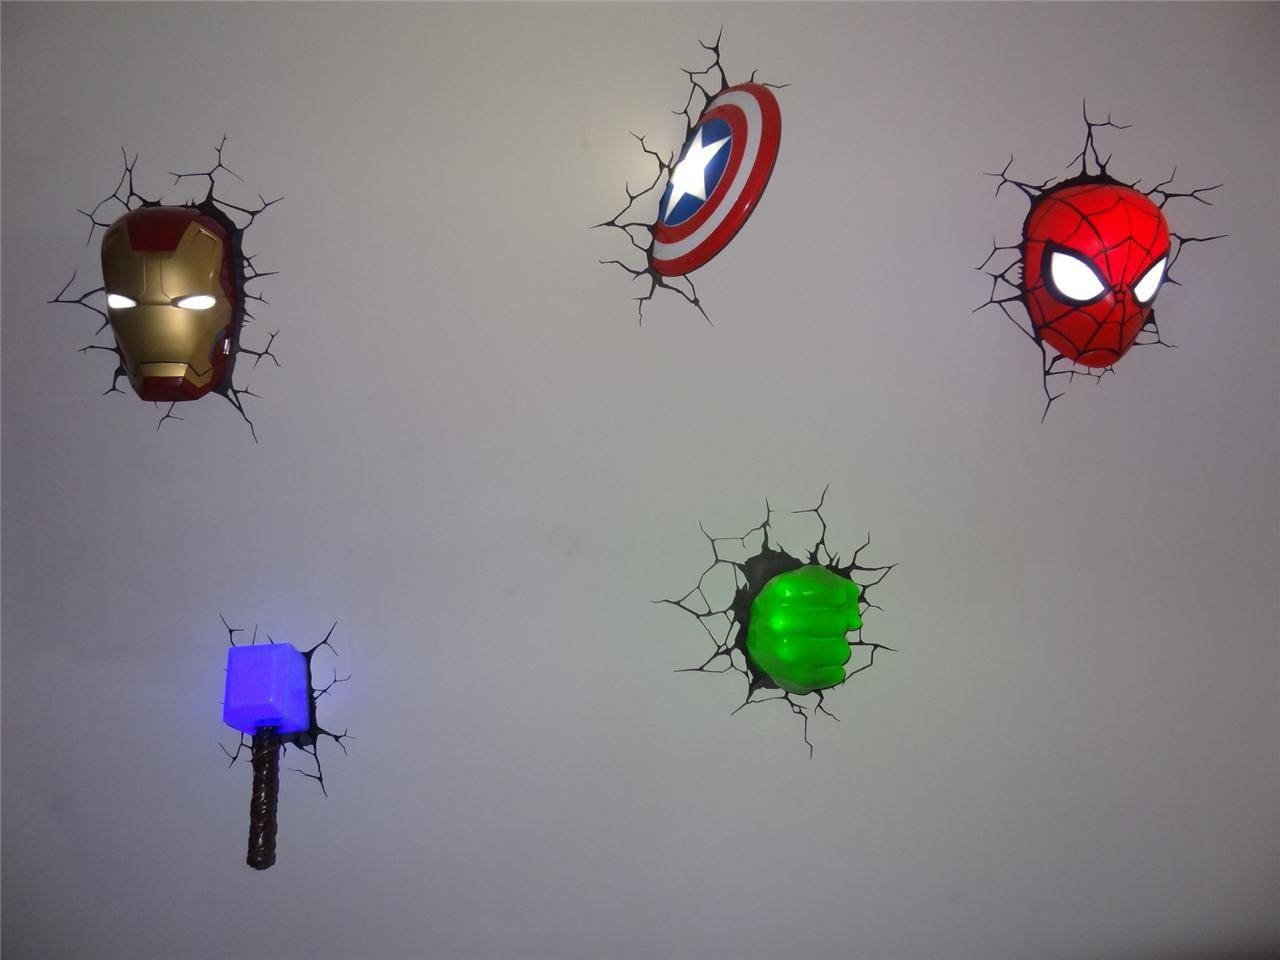 3D Wall Art Avengers Uk | Wallartideas With Regard To Most Current Marvel 3D Wall Art (Gallery 1 of 20)